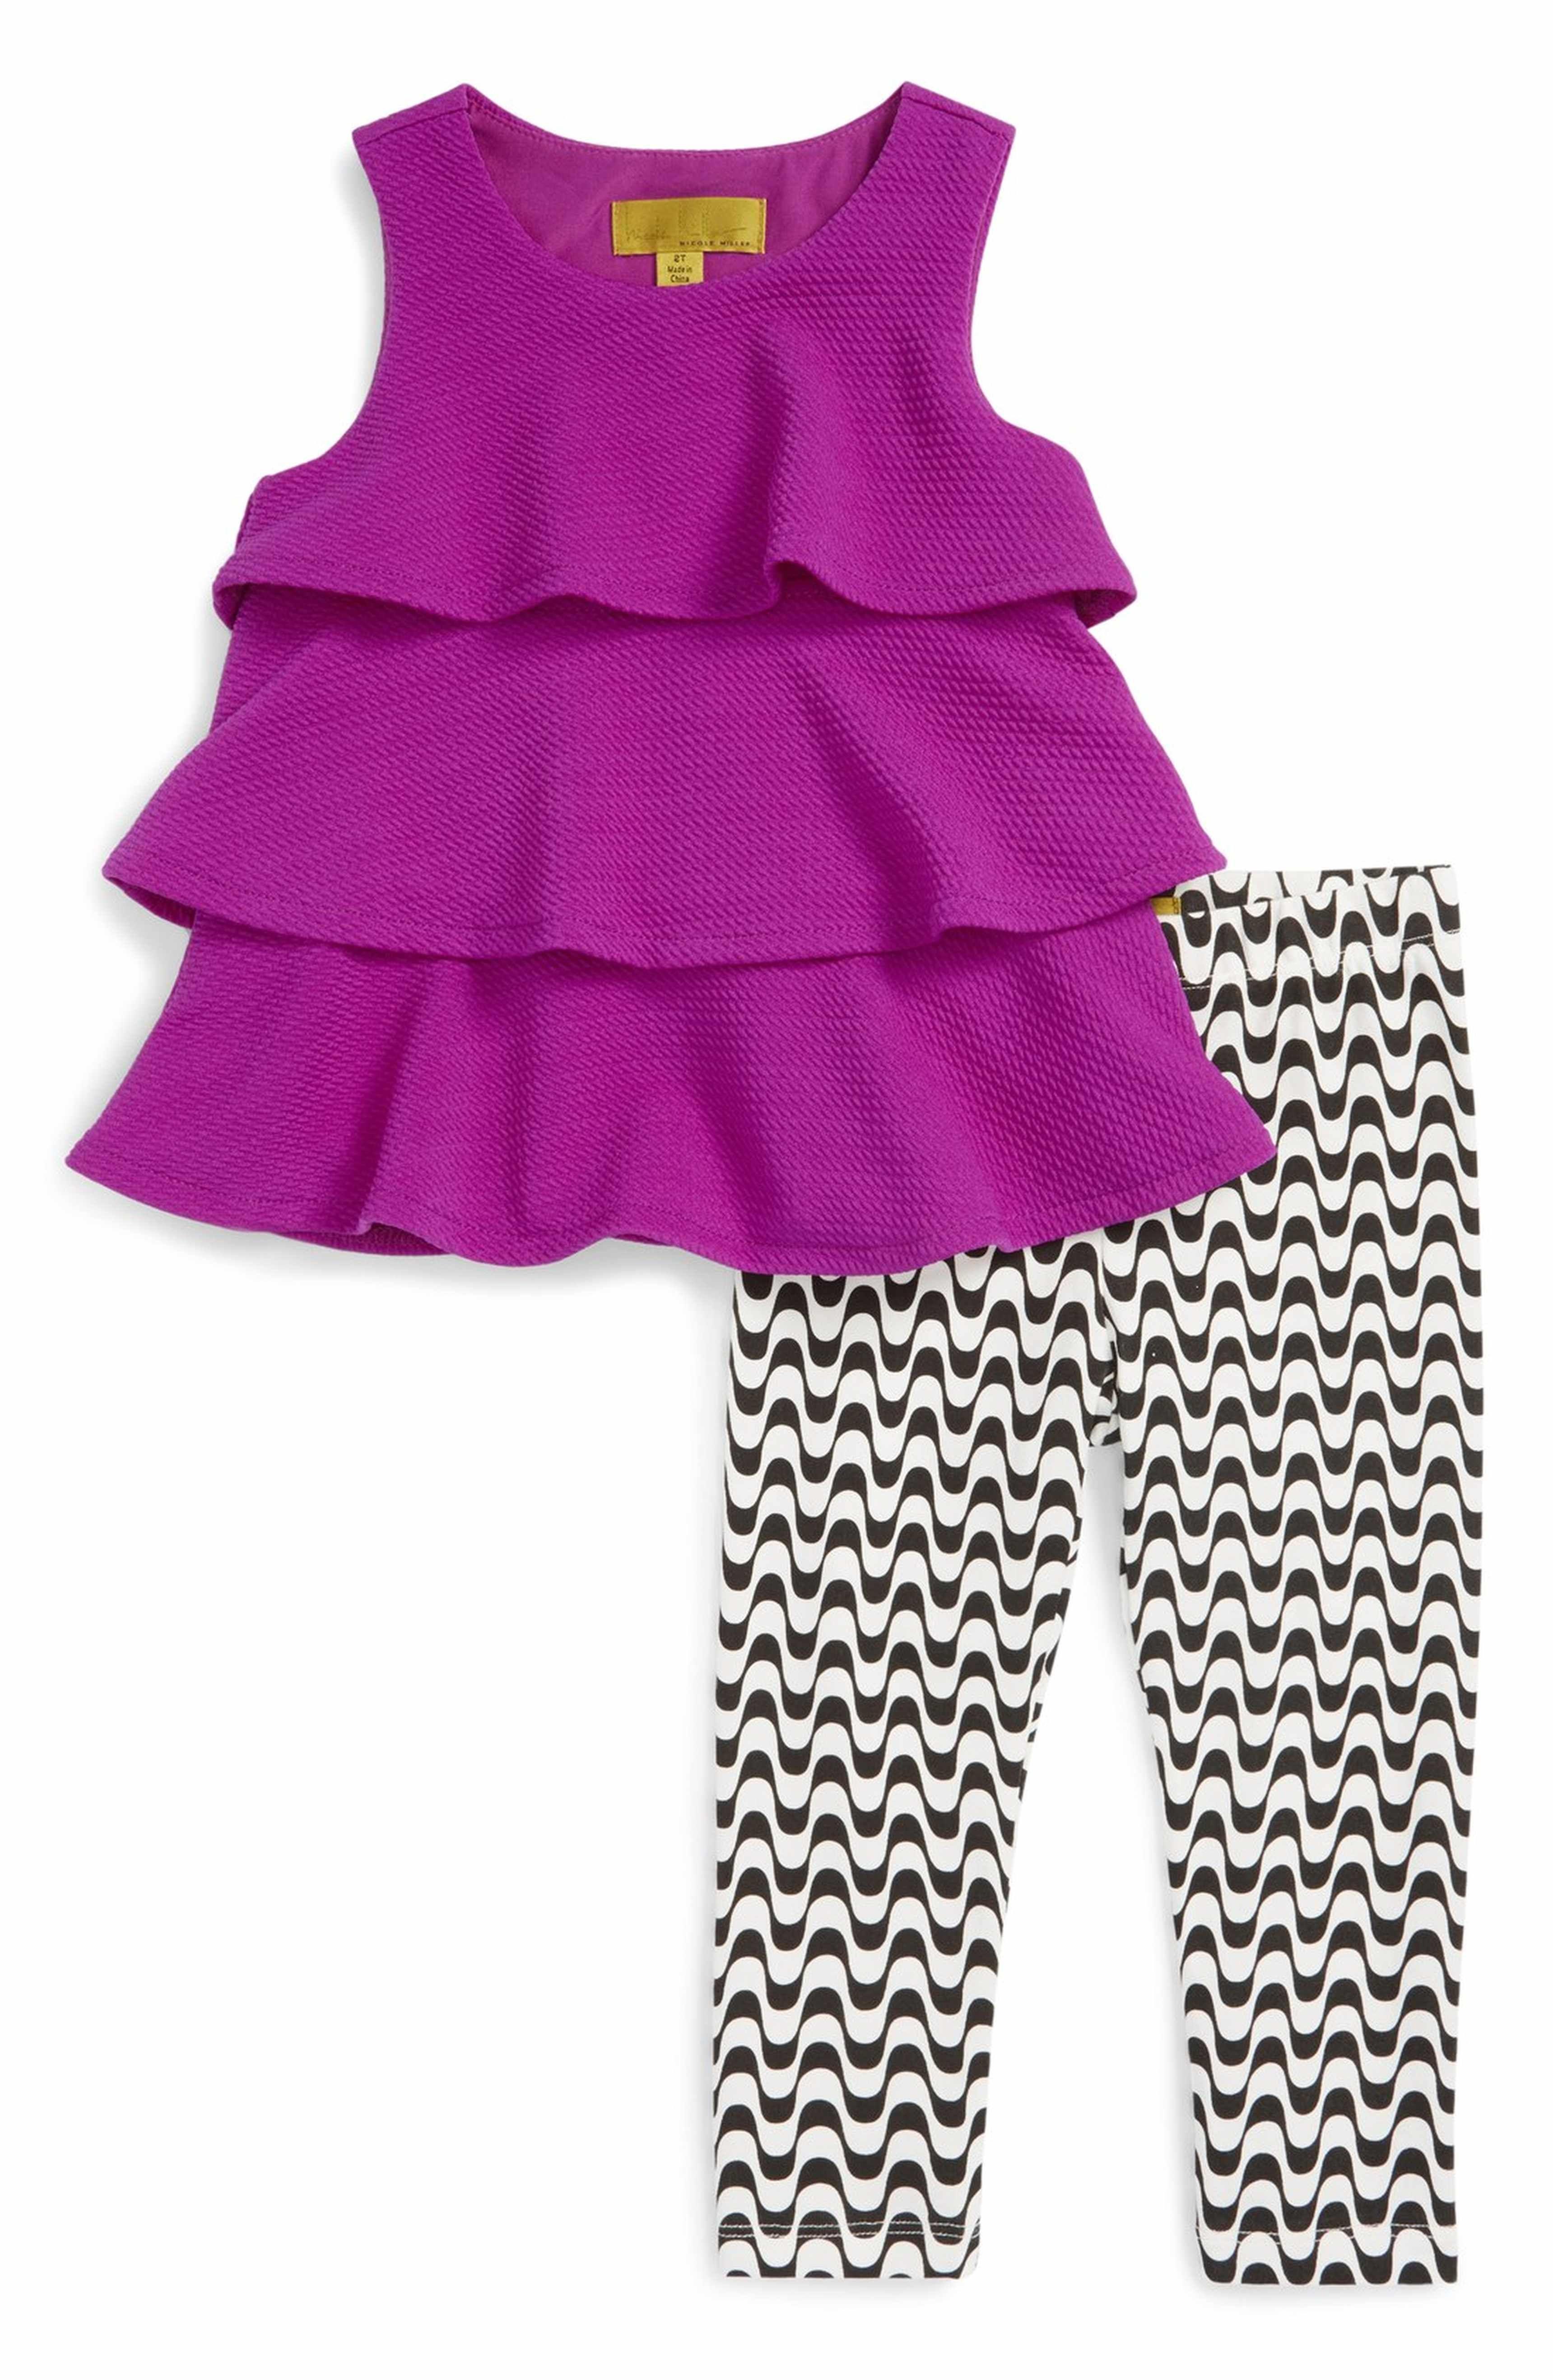 Main Image - Nicole Miller Knit Ruffle Top & Print Leggings Set ...